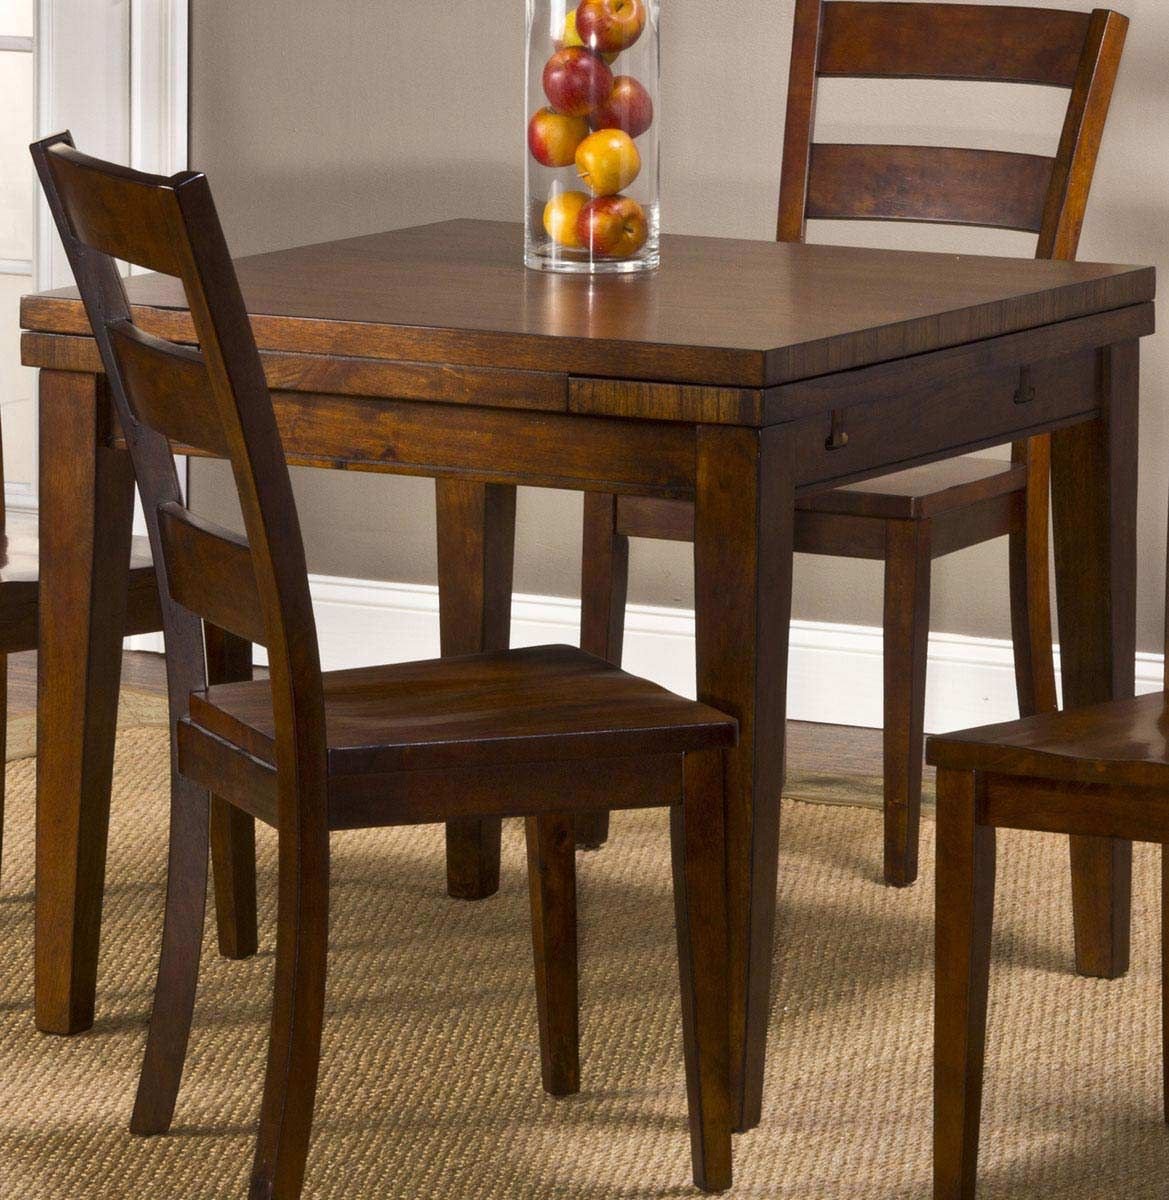 Hillsdale Furniture Harrods Creek Square Gathering Dining Table With Drop Leaf Medium Brown Oak Finish